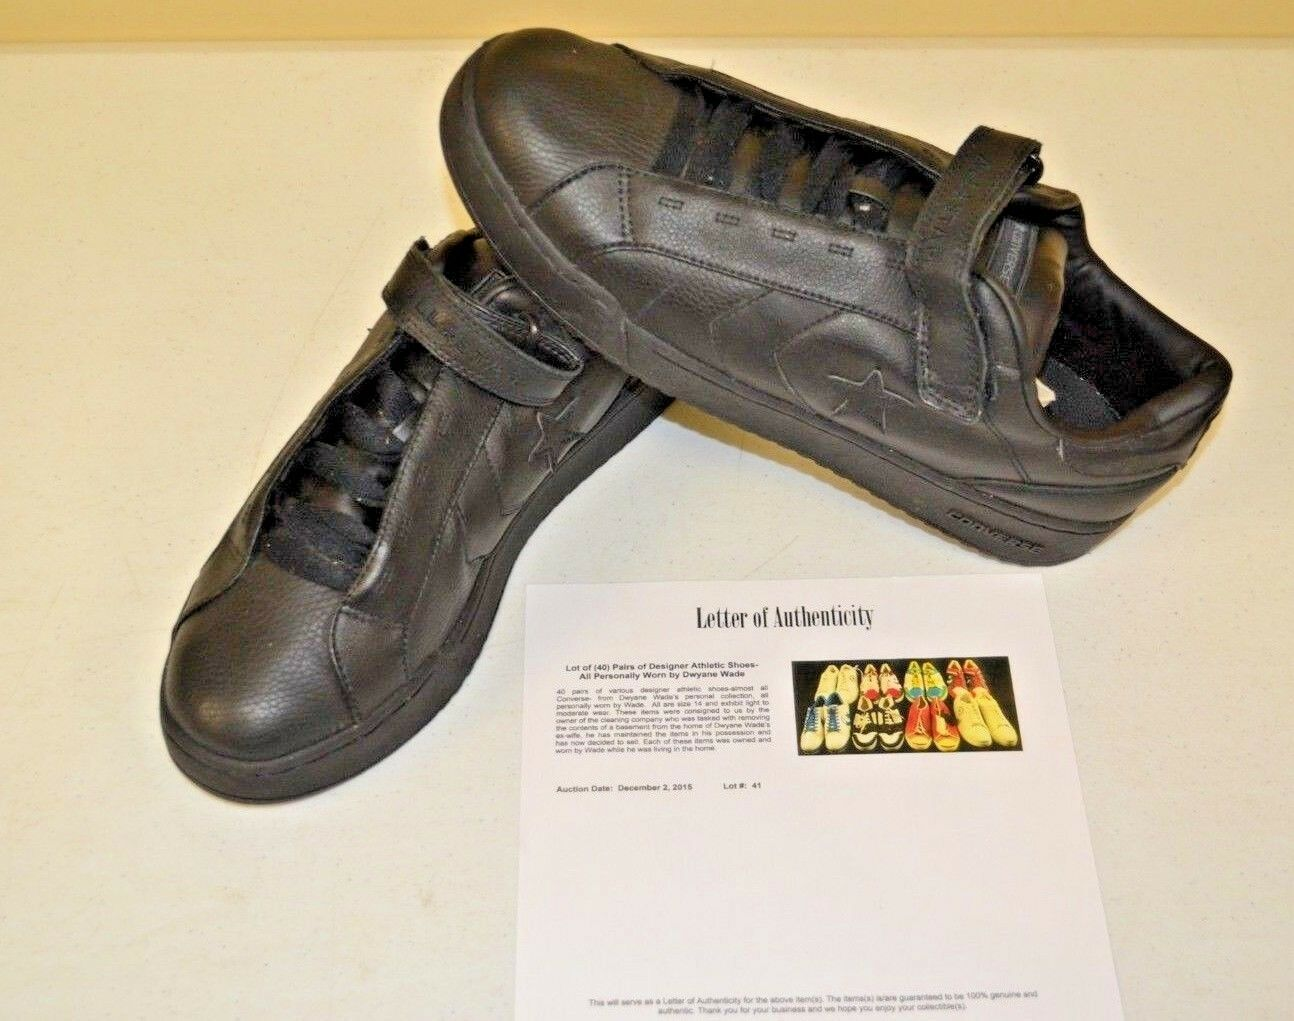 Converse All Star Black Strap Basketball Sz 14 DWAYNE WADE Personal shoes w COA